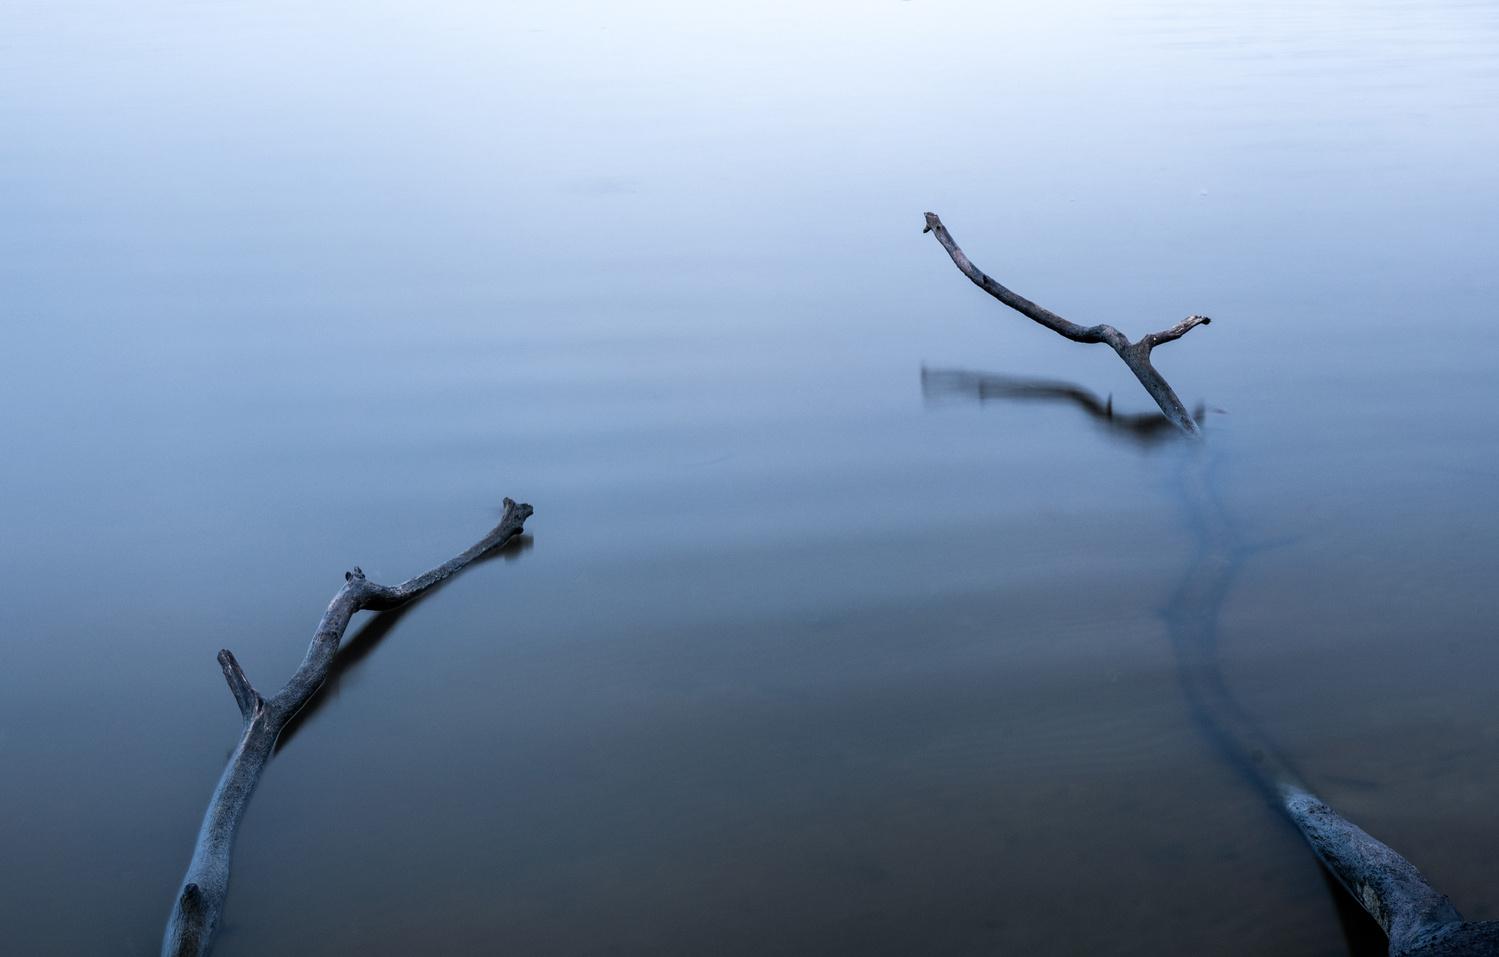 Simplicity by jason stuempges